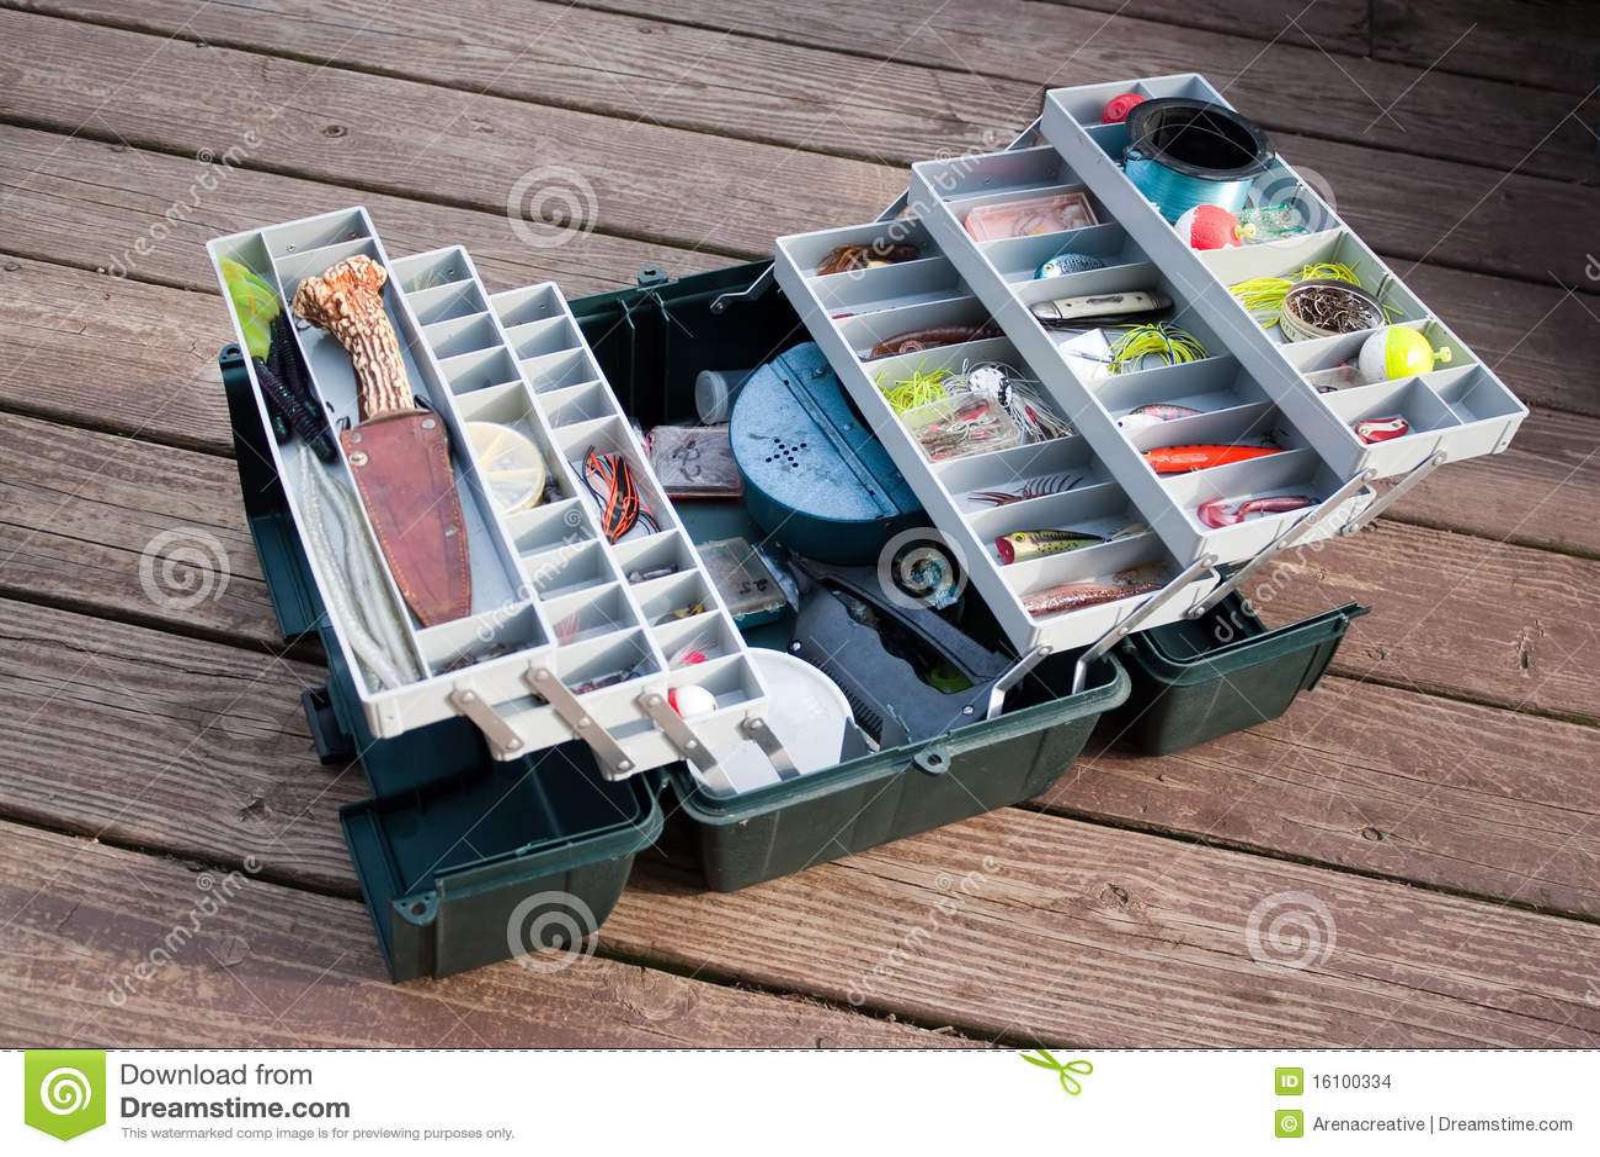 коробочки пользу кого рыбалки фото